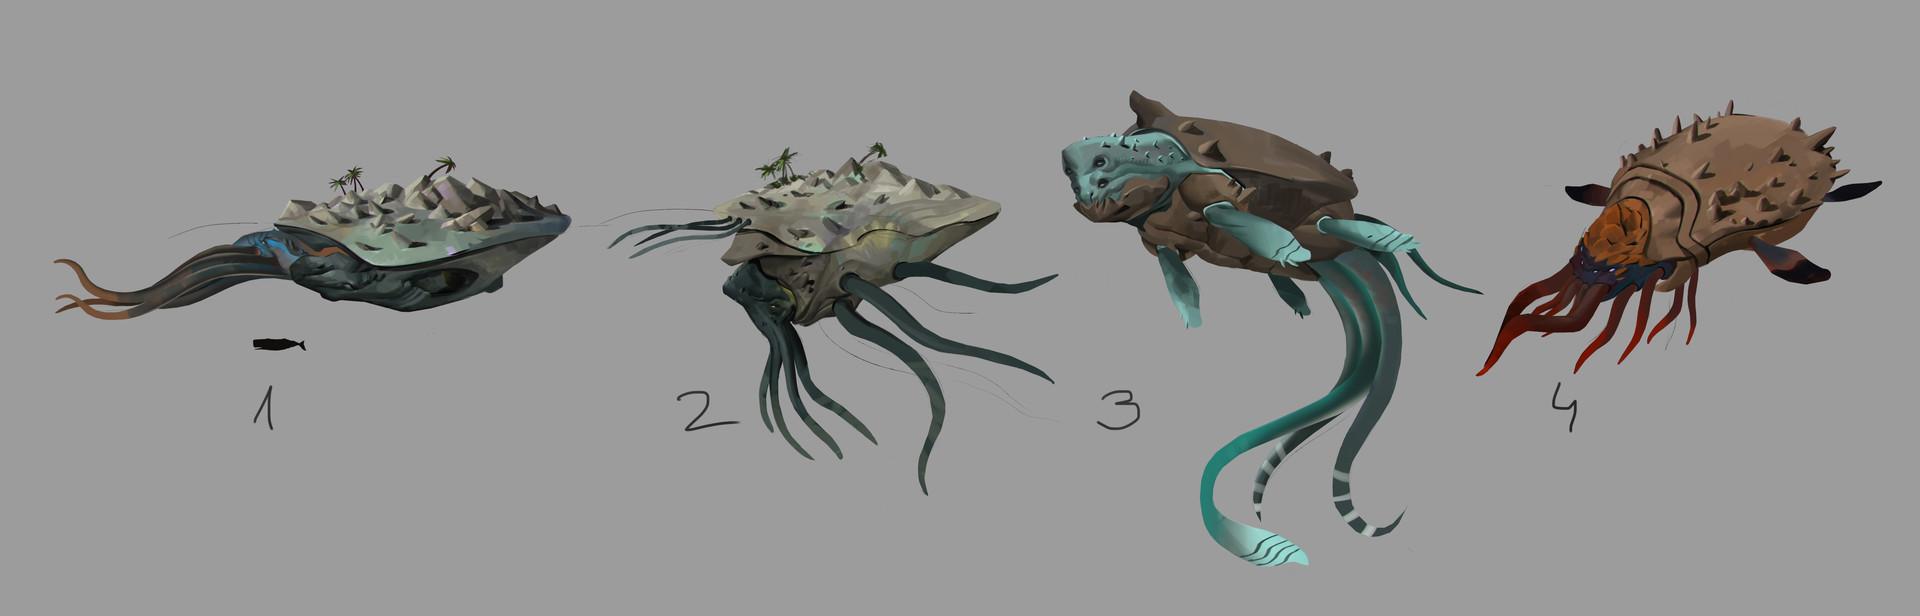 Lucaciu roland kraken concepts